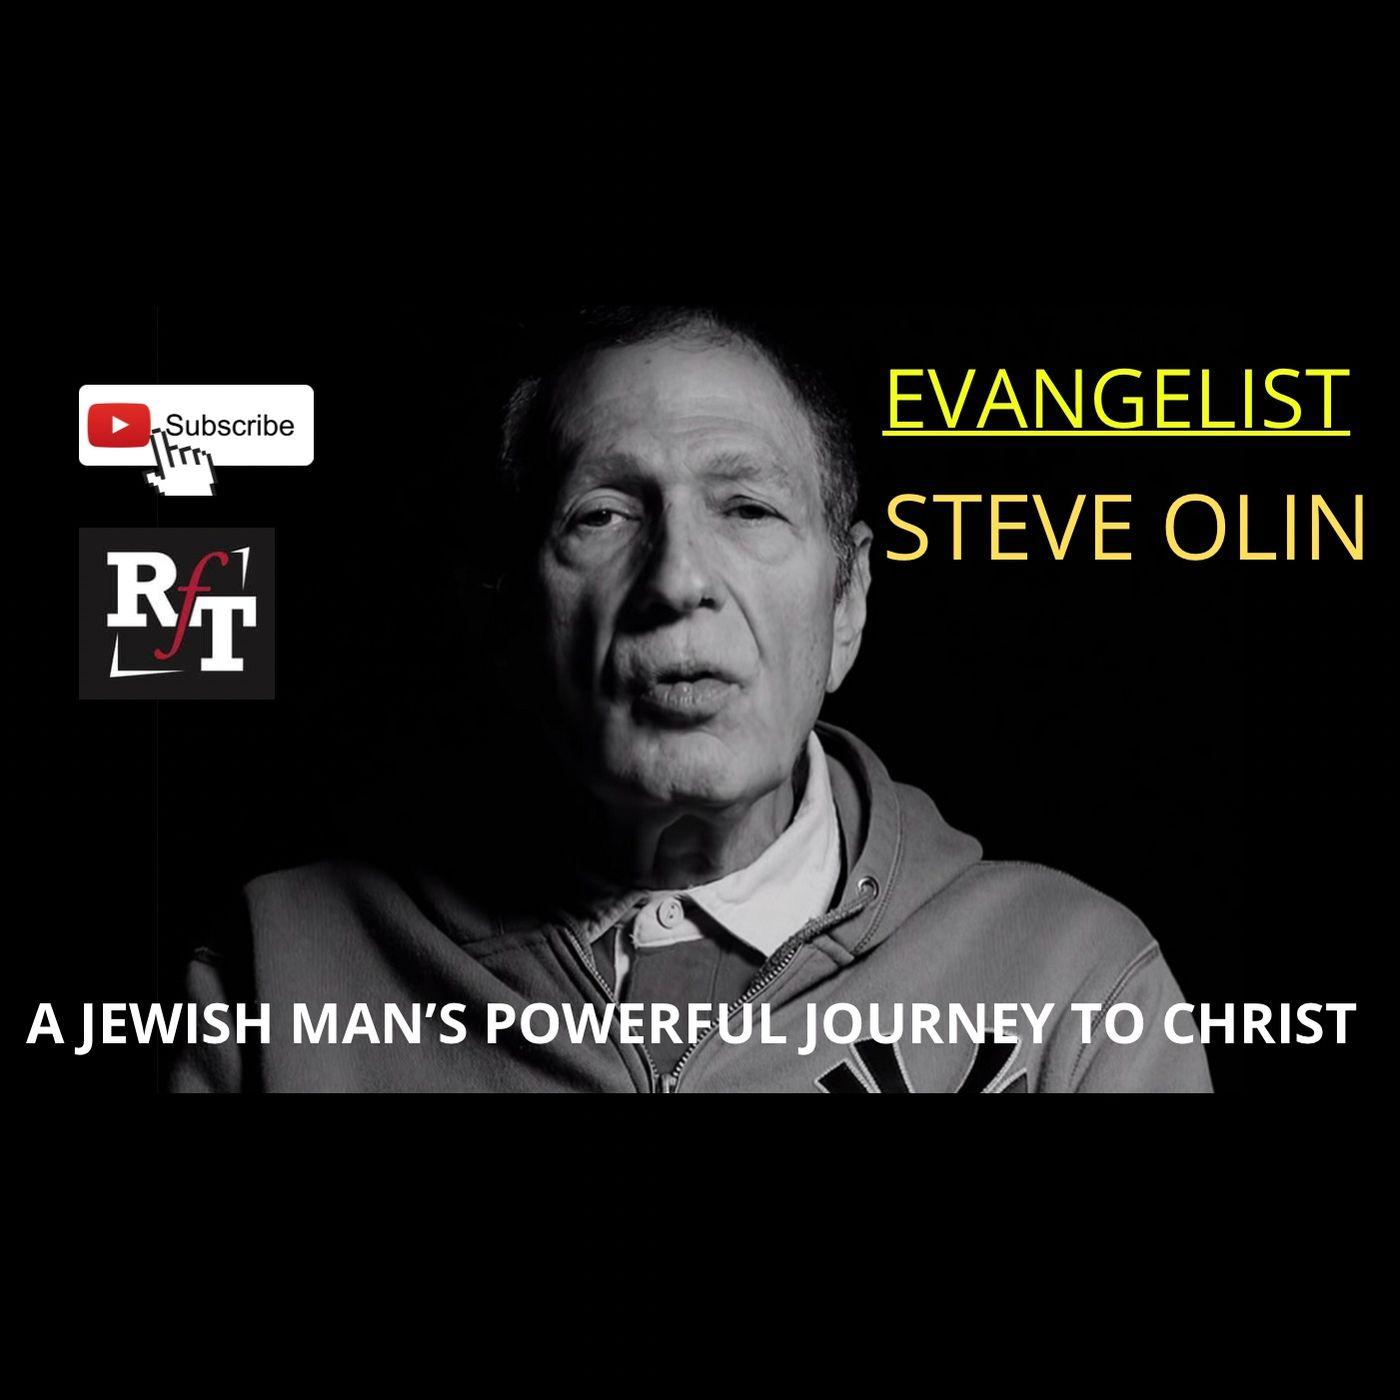 Evangelist Steve Olin-A Jewish Journey To Christ - 4:12:21, 8.34 PM